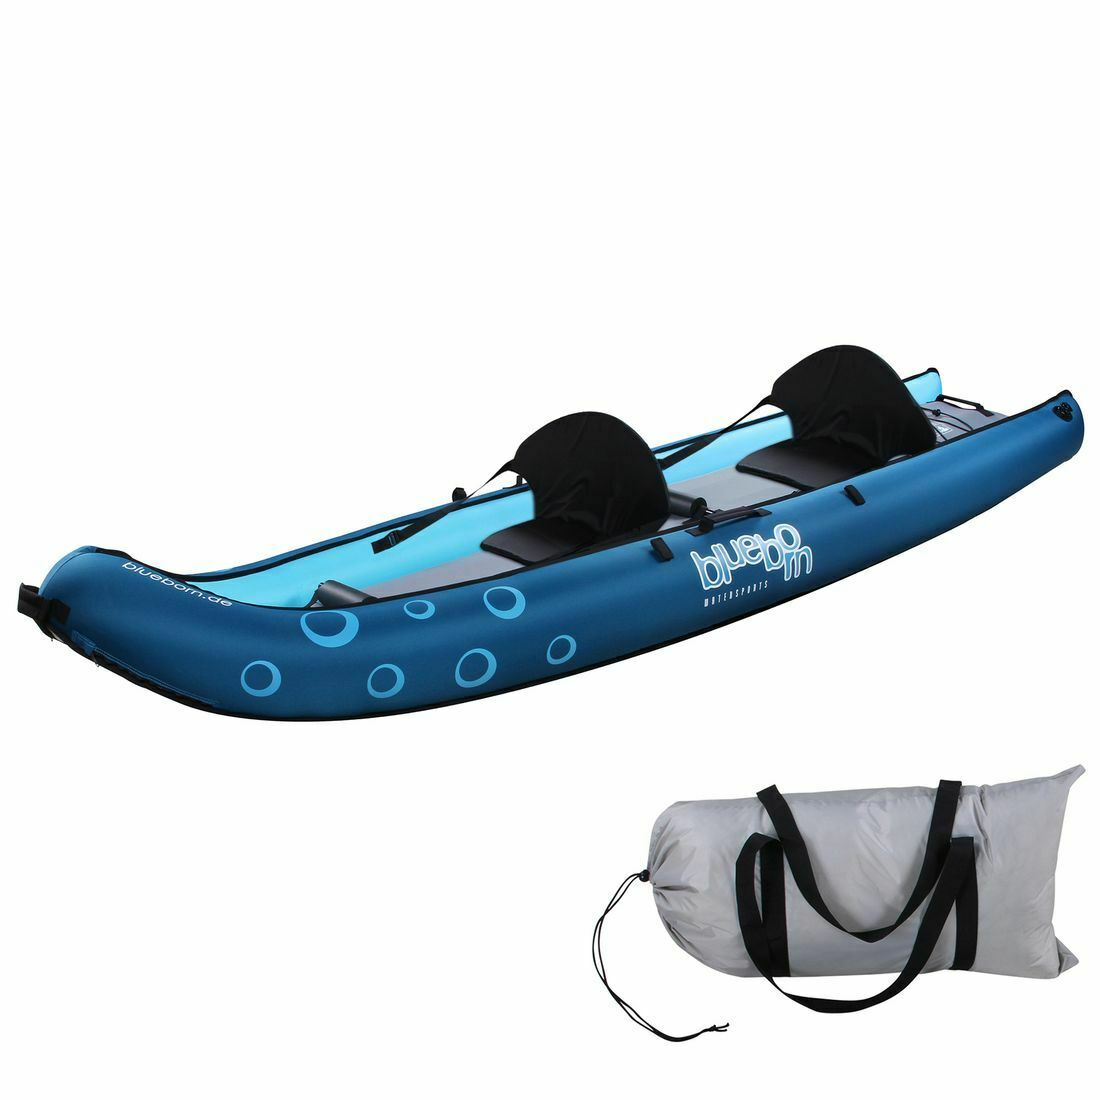 Boot Coasteer SRE300 Sit-On-Top Boot 300x88cm 1 pers. canoe kayak rowing bluee